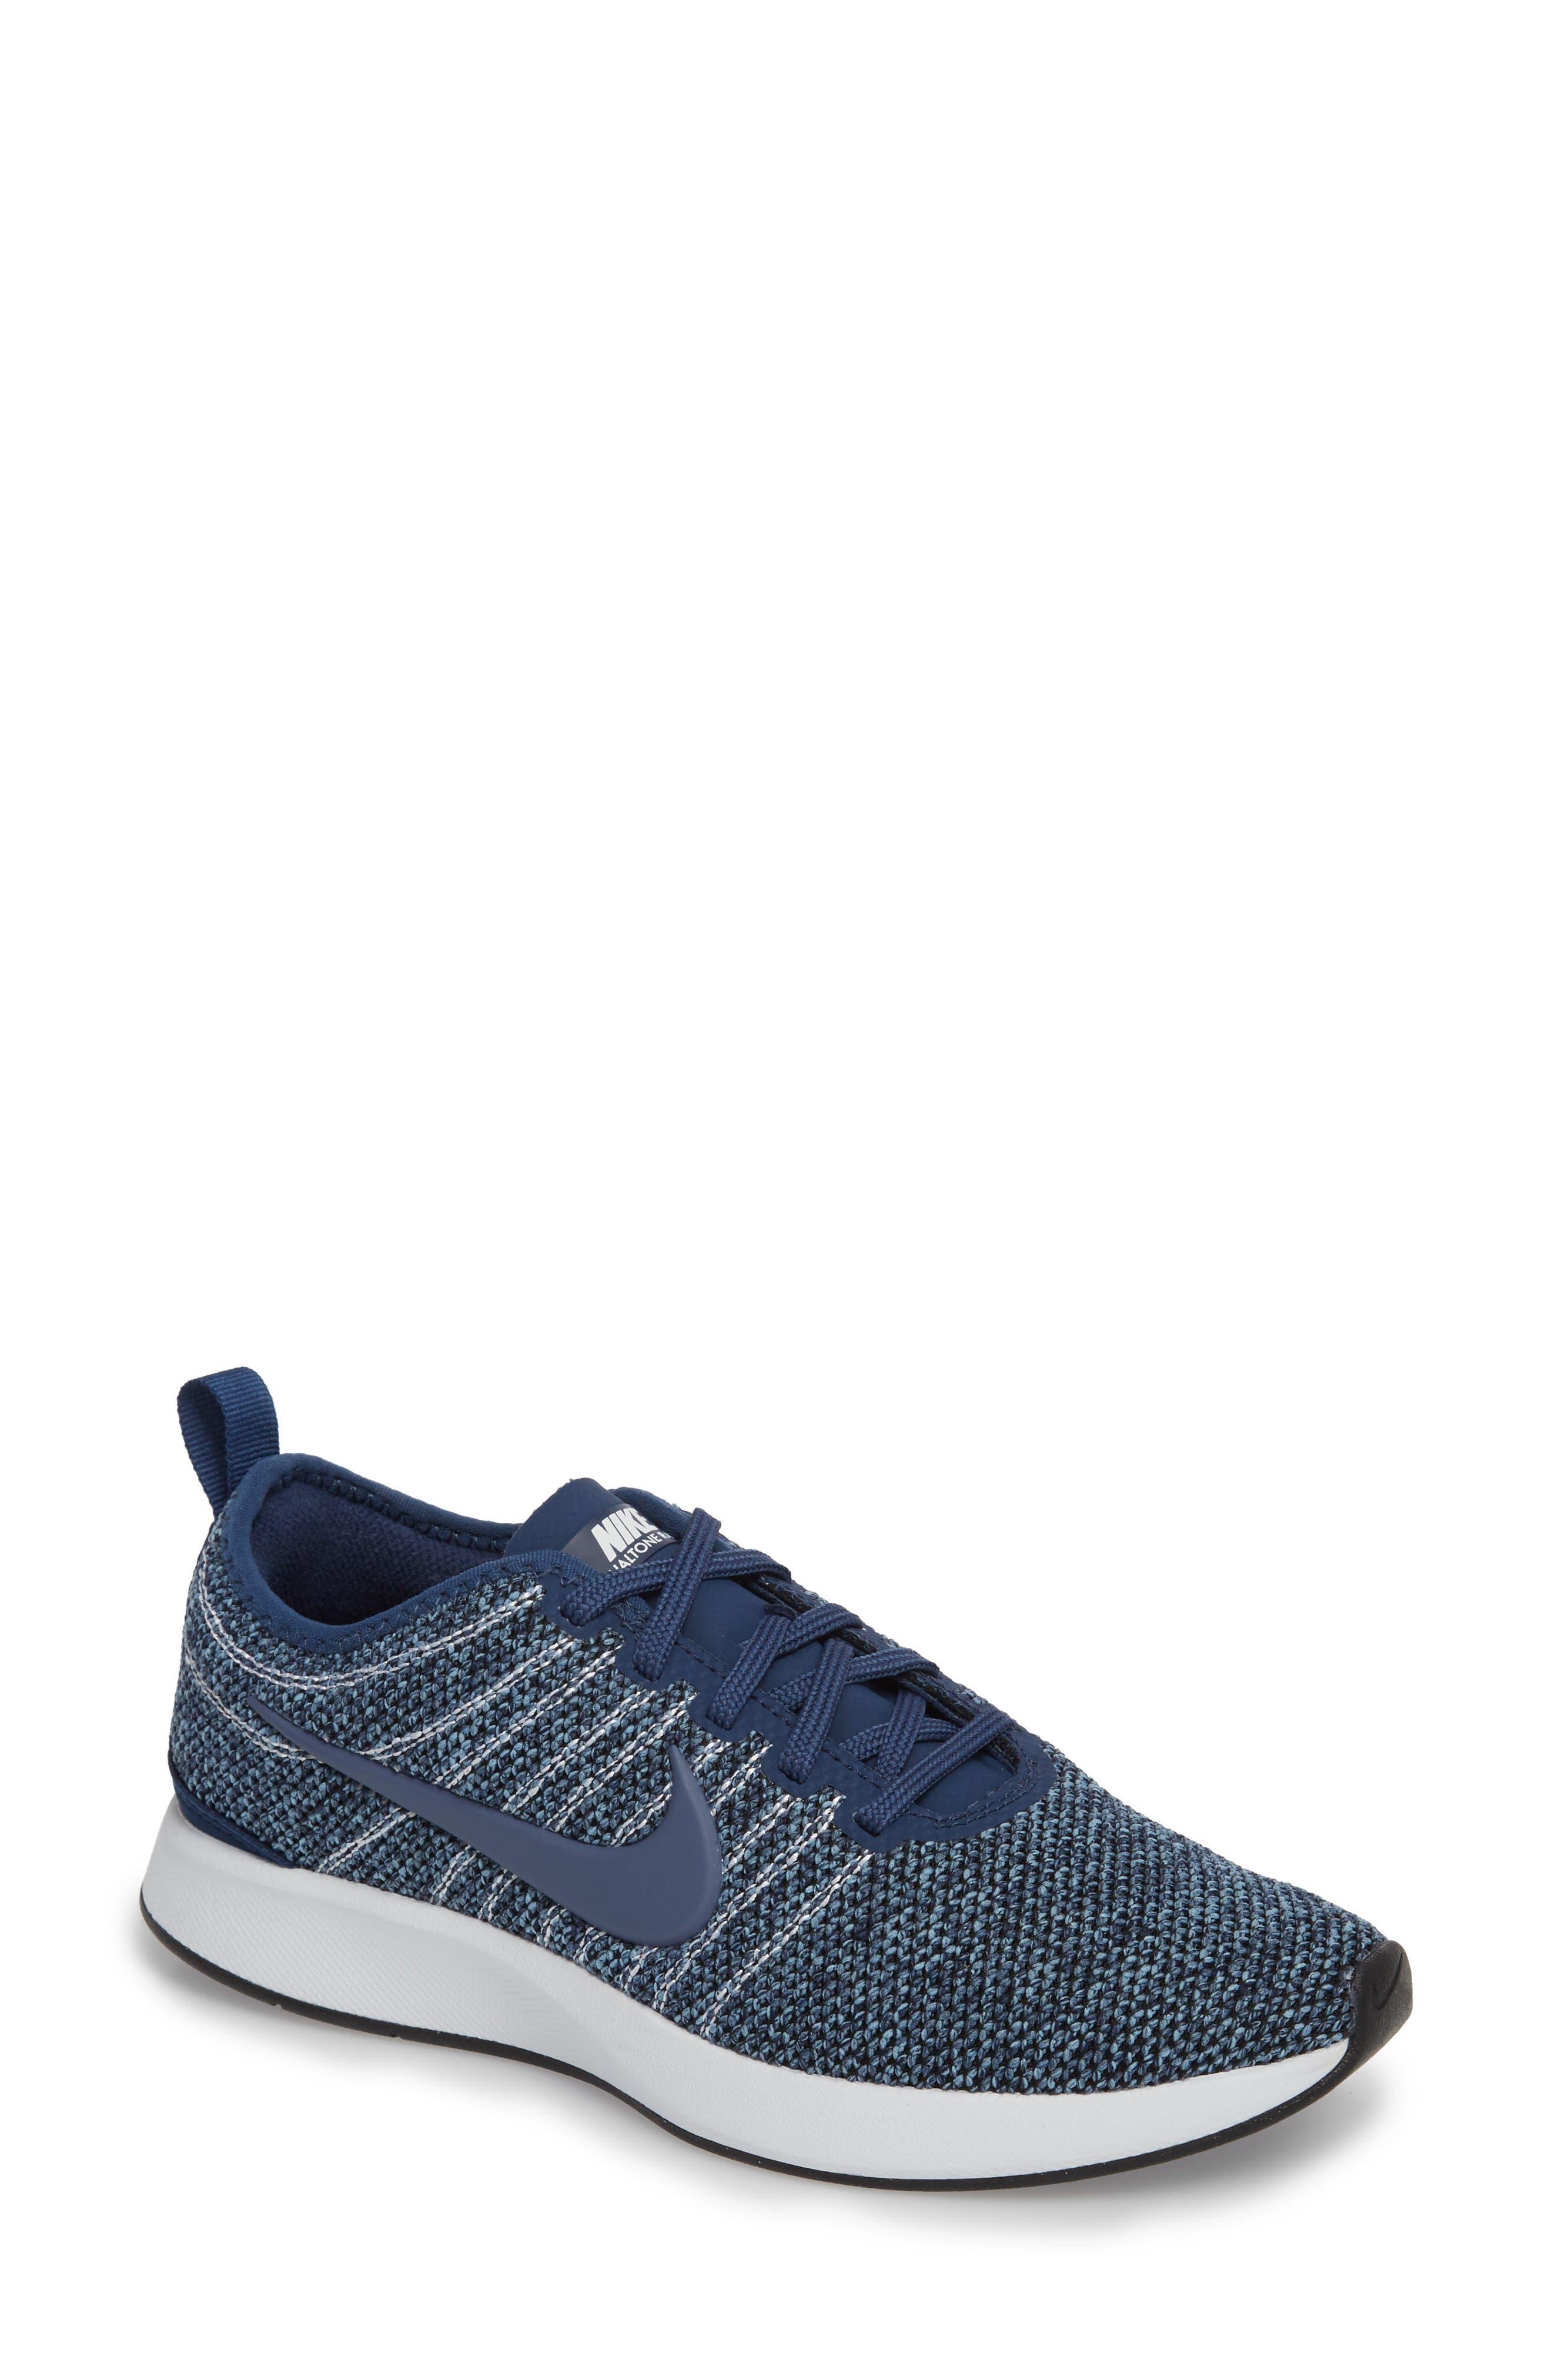 Main Image - Nike Dualtone Racer PRM Sneaker (Women)